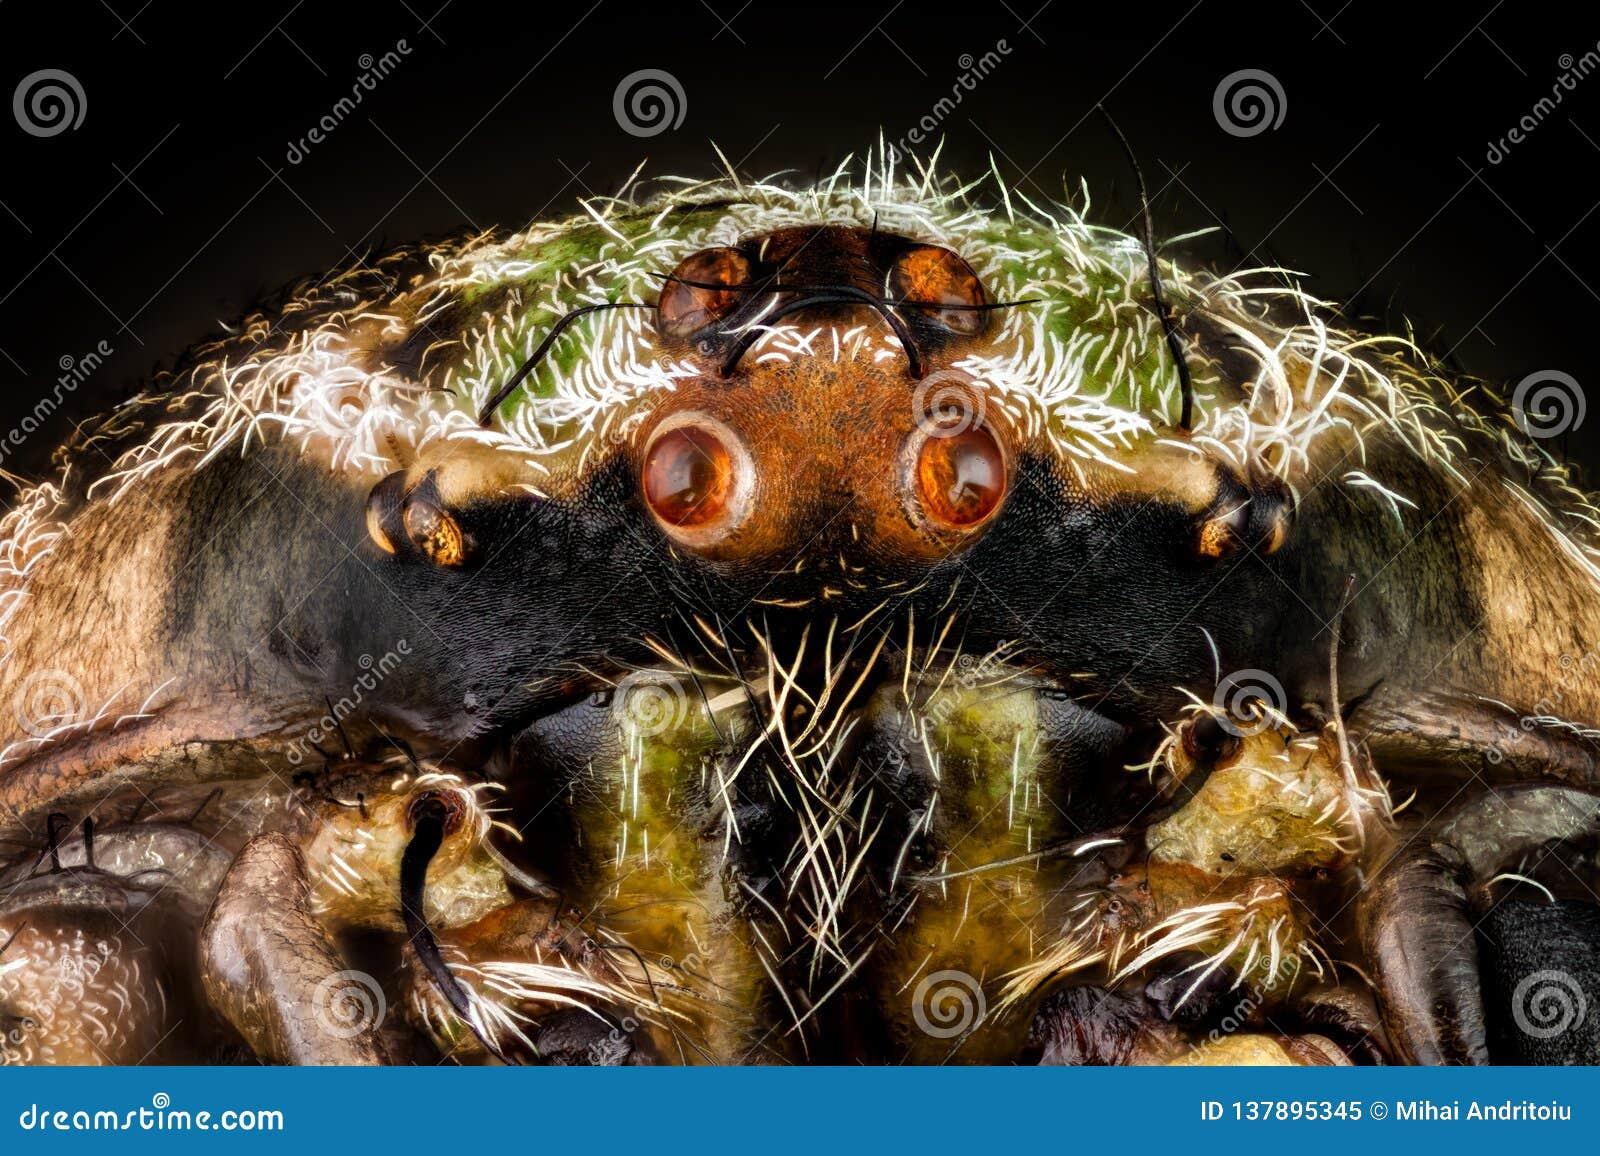 Portrait of a orbweaver spider